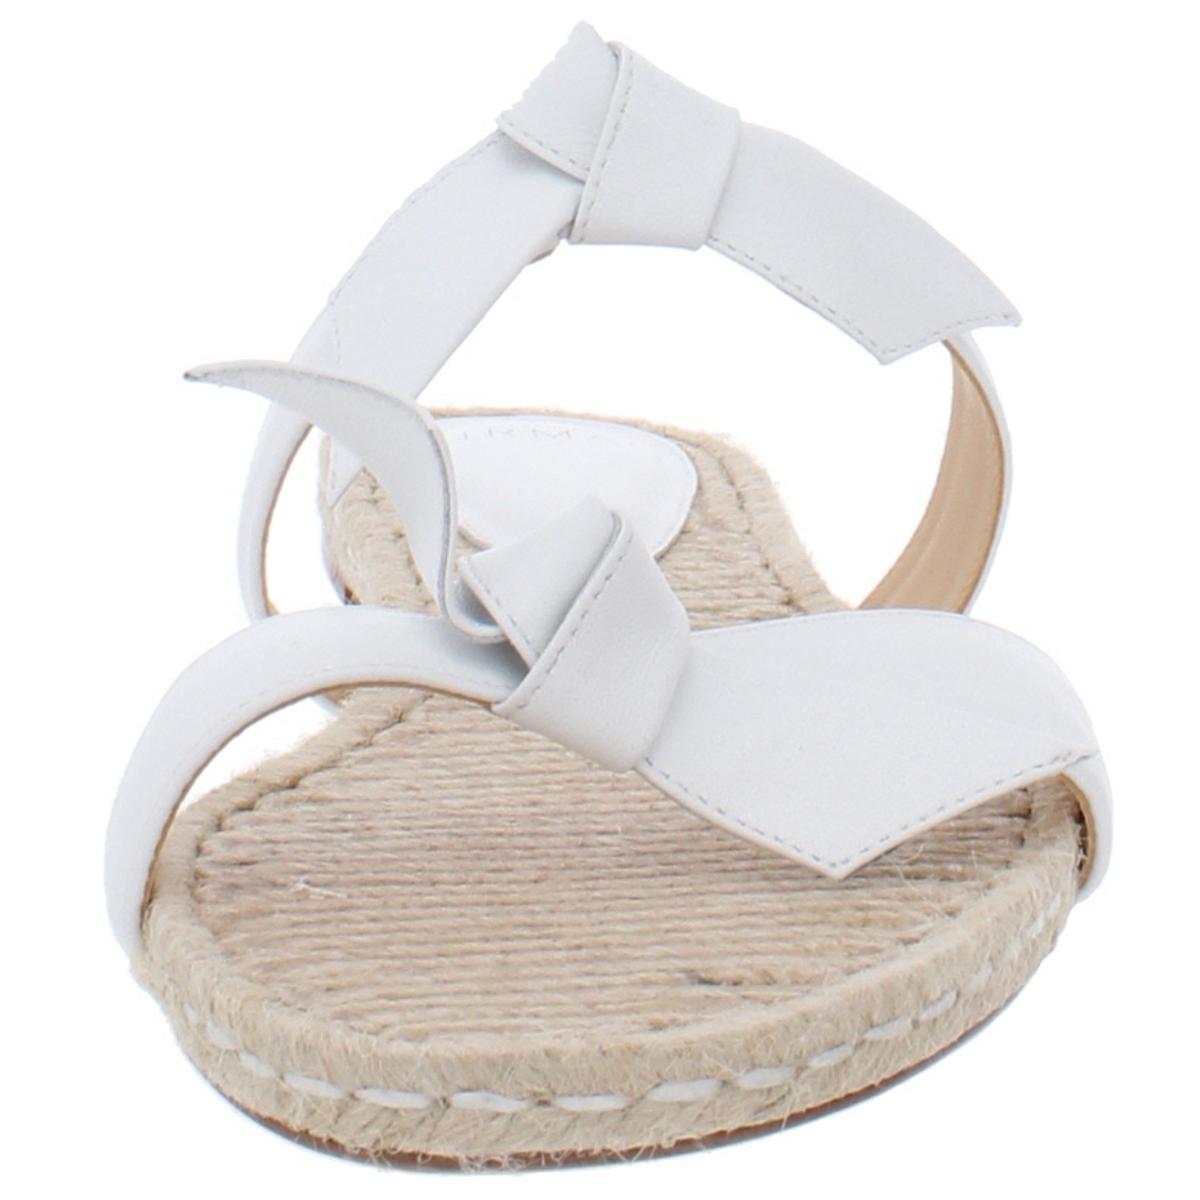 thumbnail 12 - Alexandre Birman Womens Clarita Leather Flats Slide Sandals Shoes BHFO 6244